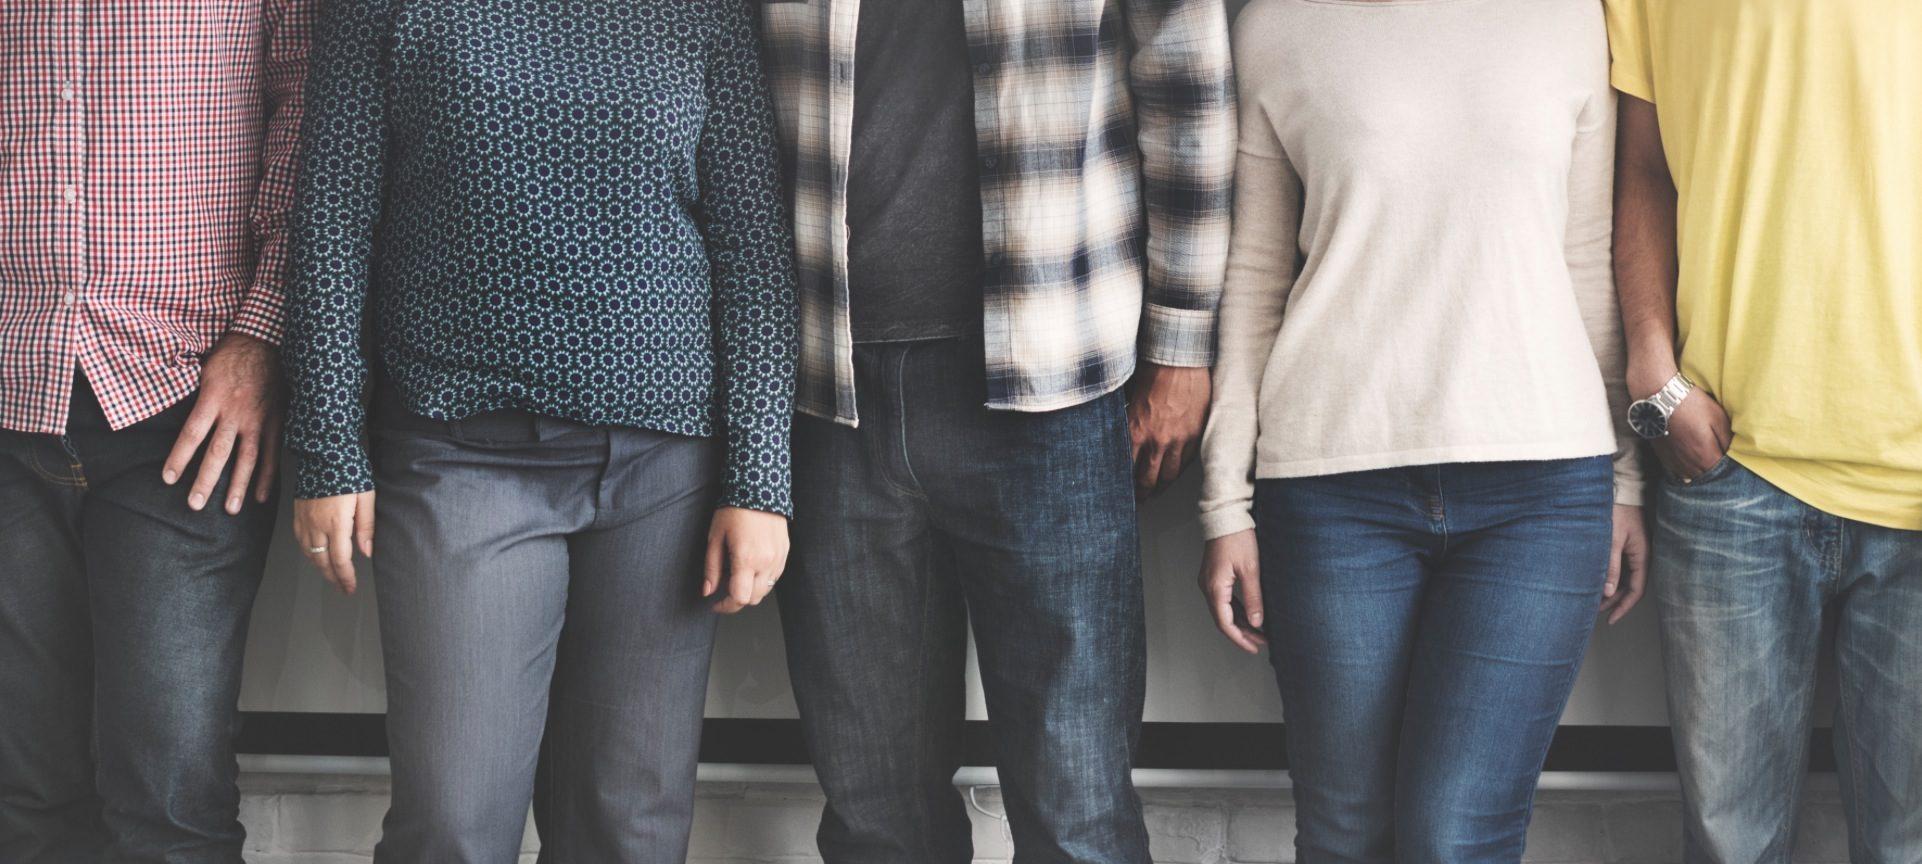 Emotional Intelligence in Goal-Setting activates groups